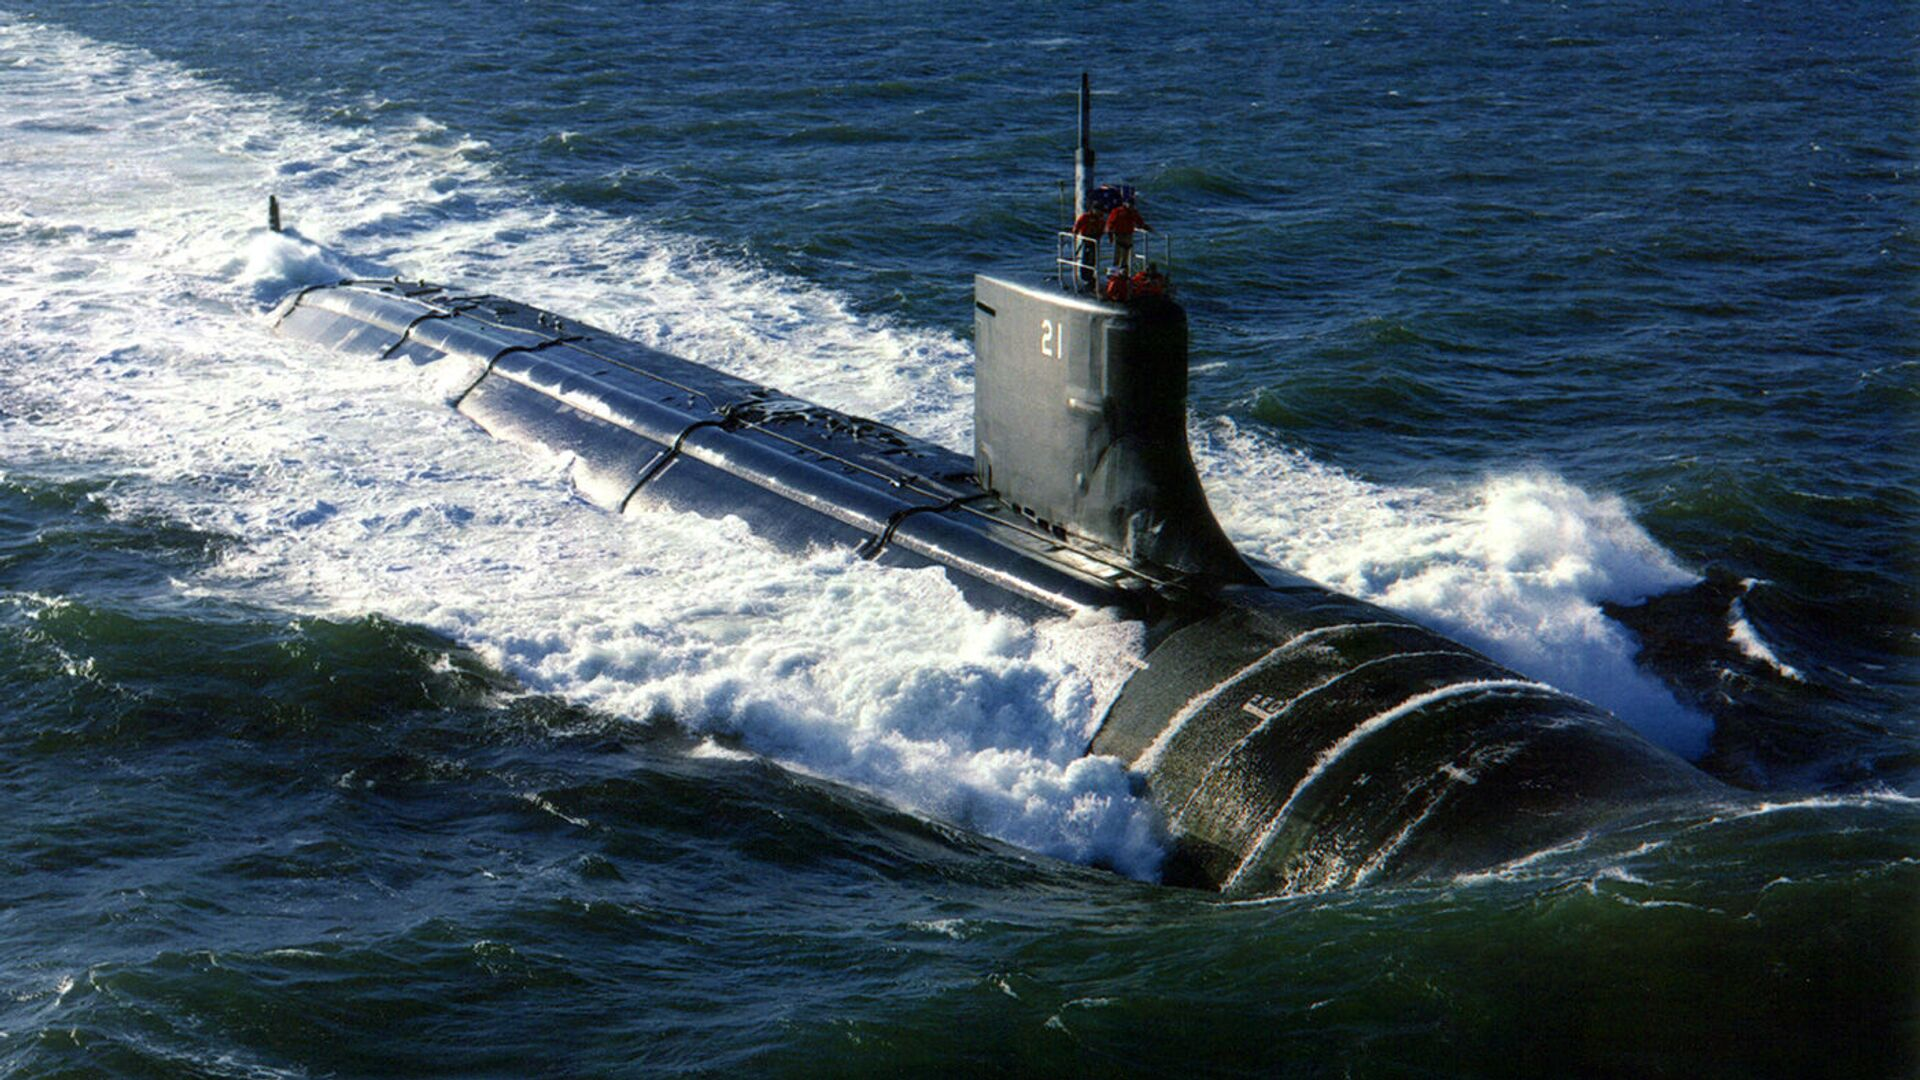 Tàu ngầm hạt nhân USS Seawolf - Sputnik Việt Nam, 1920, 04.06.2021